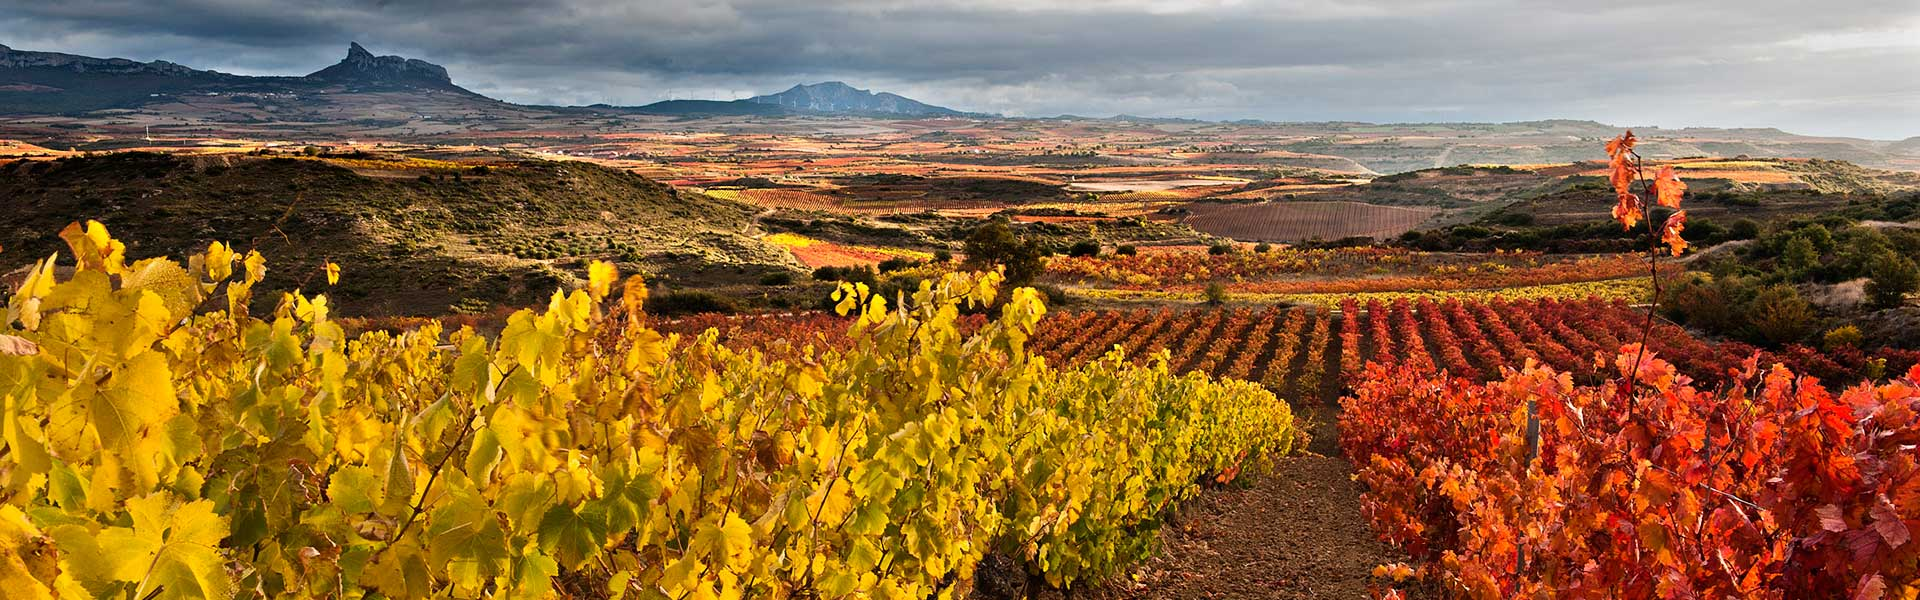 Bodegas Ondalán. Paisaje de viñedo de Rioja Alavesa